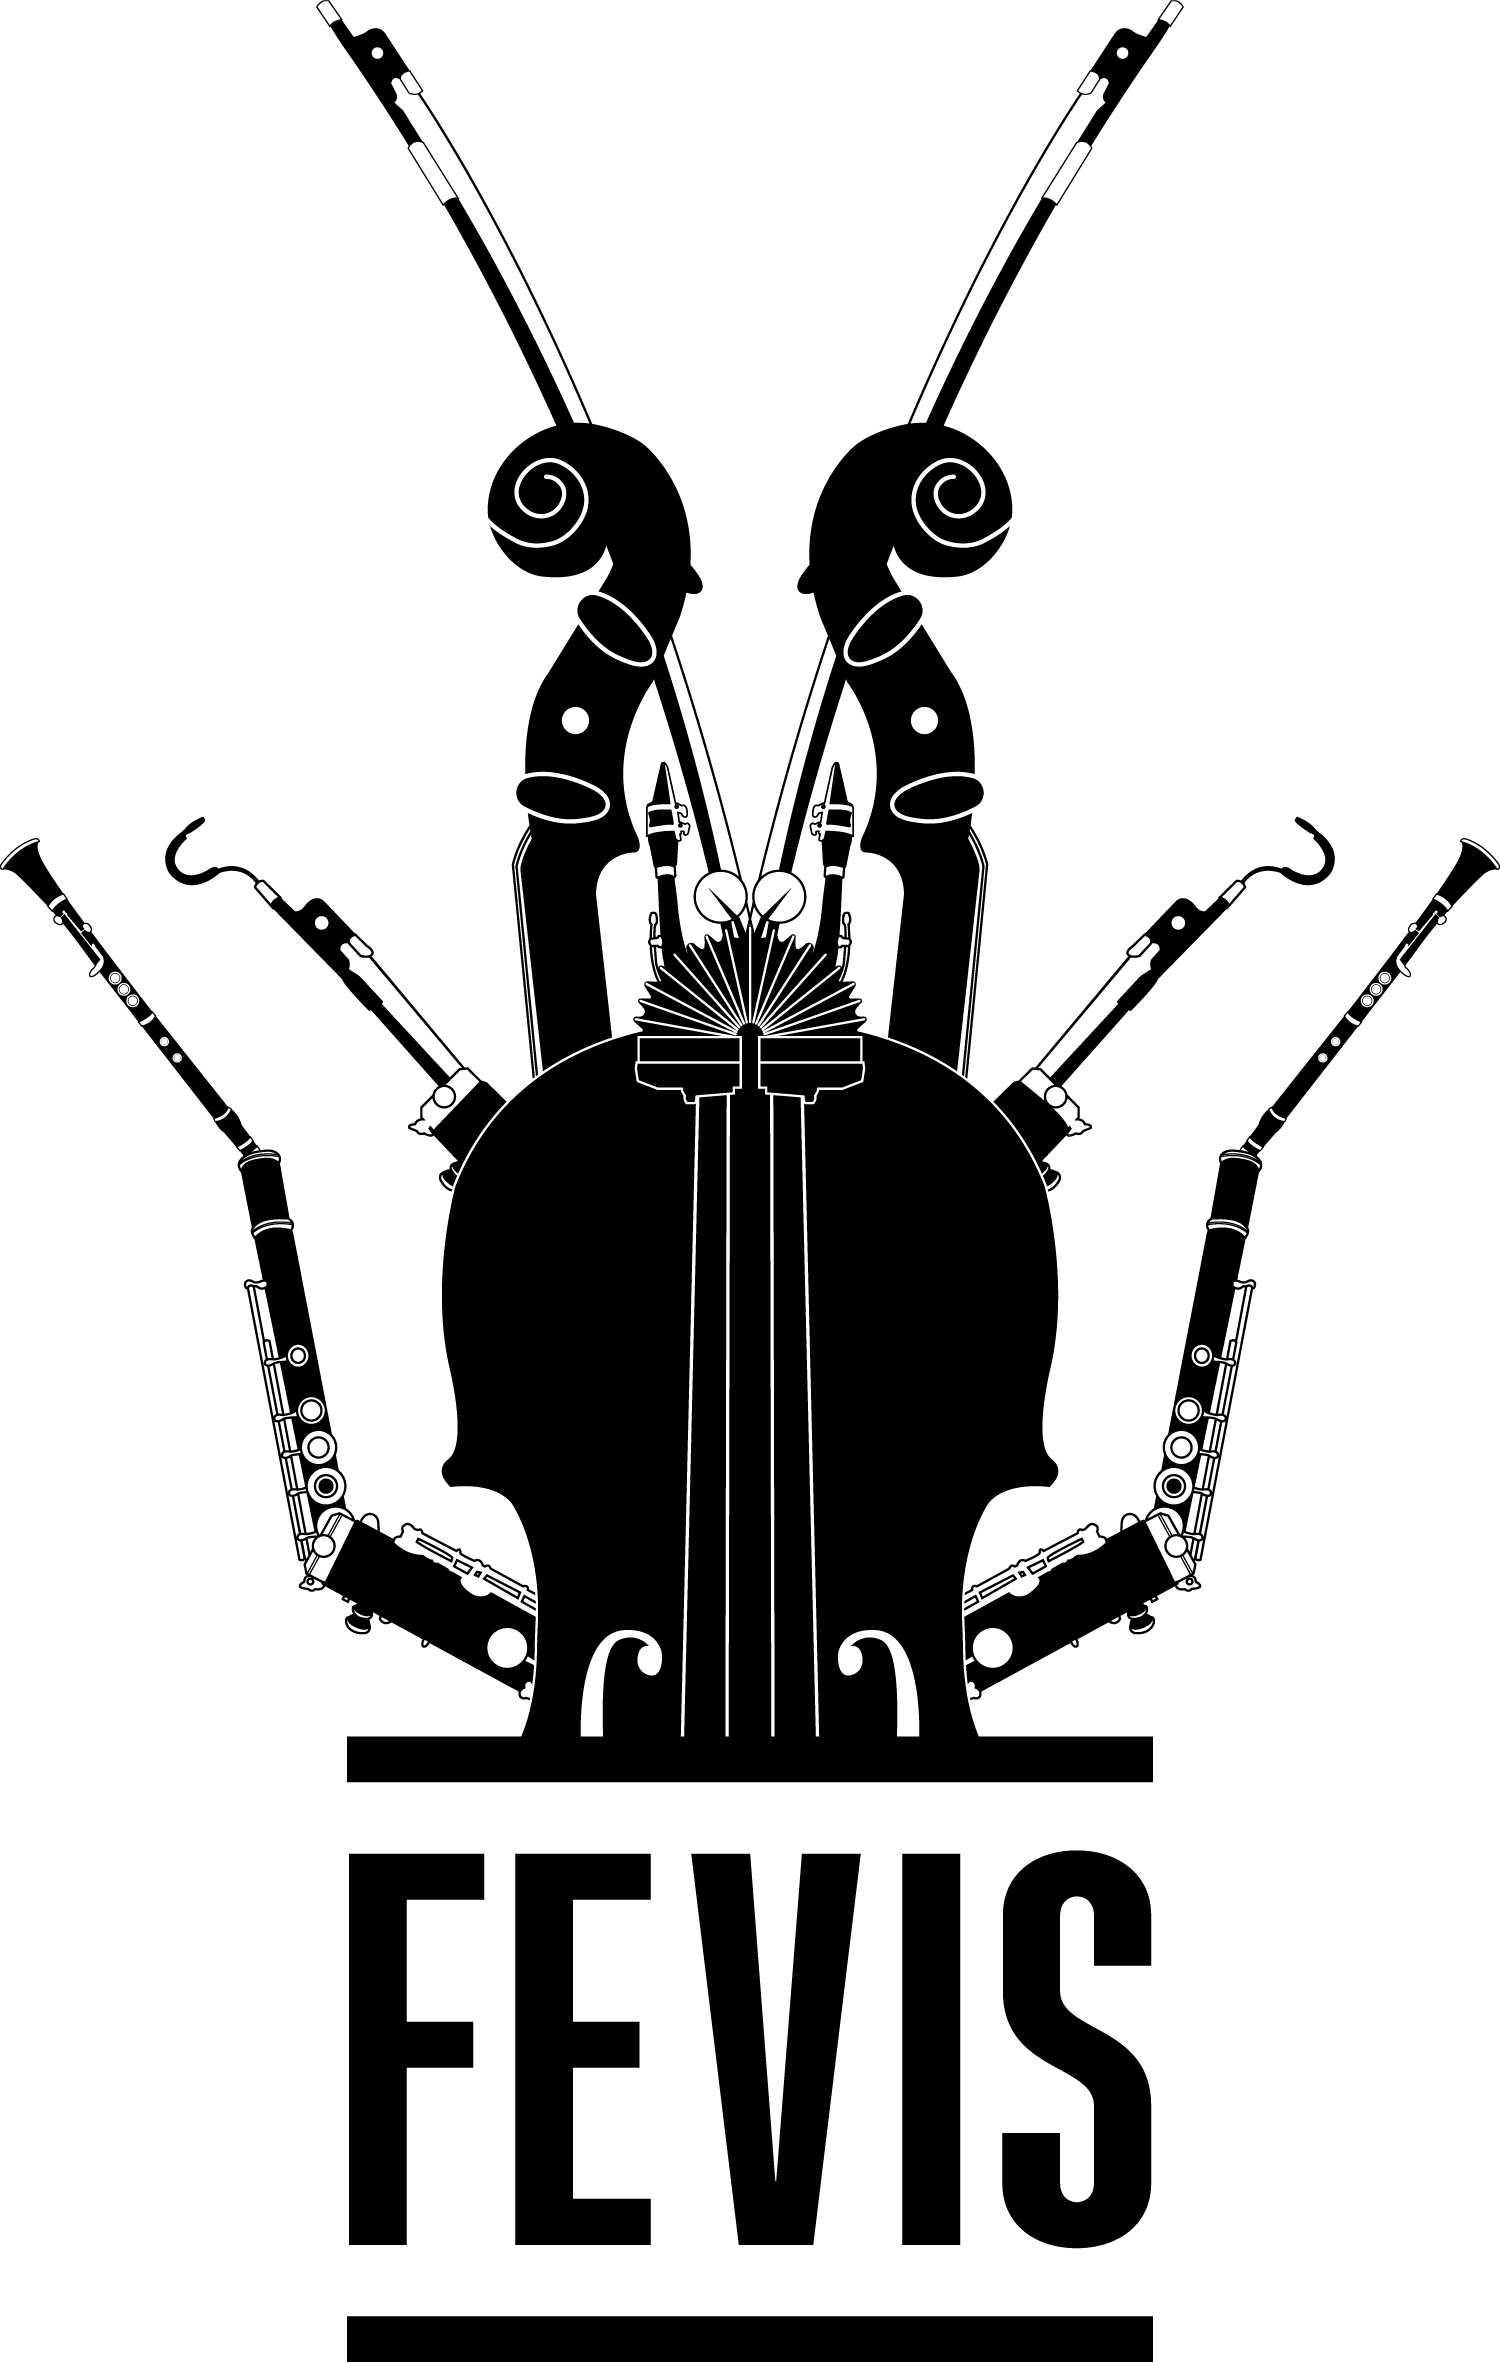 Logo fevis